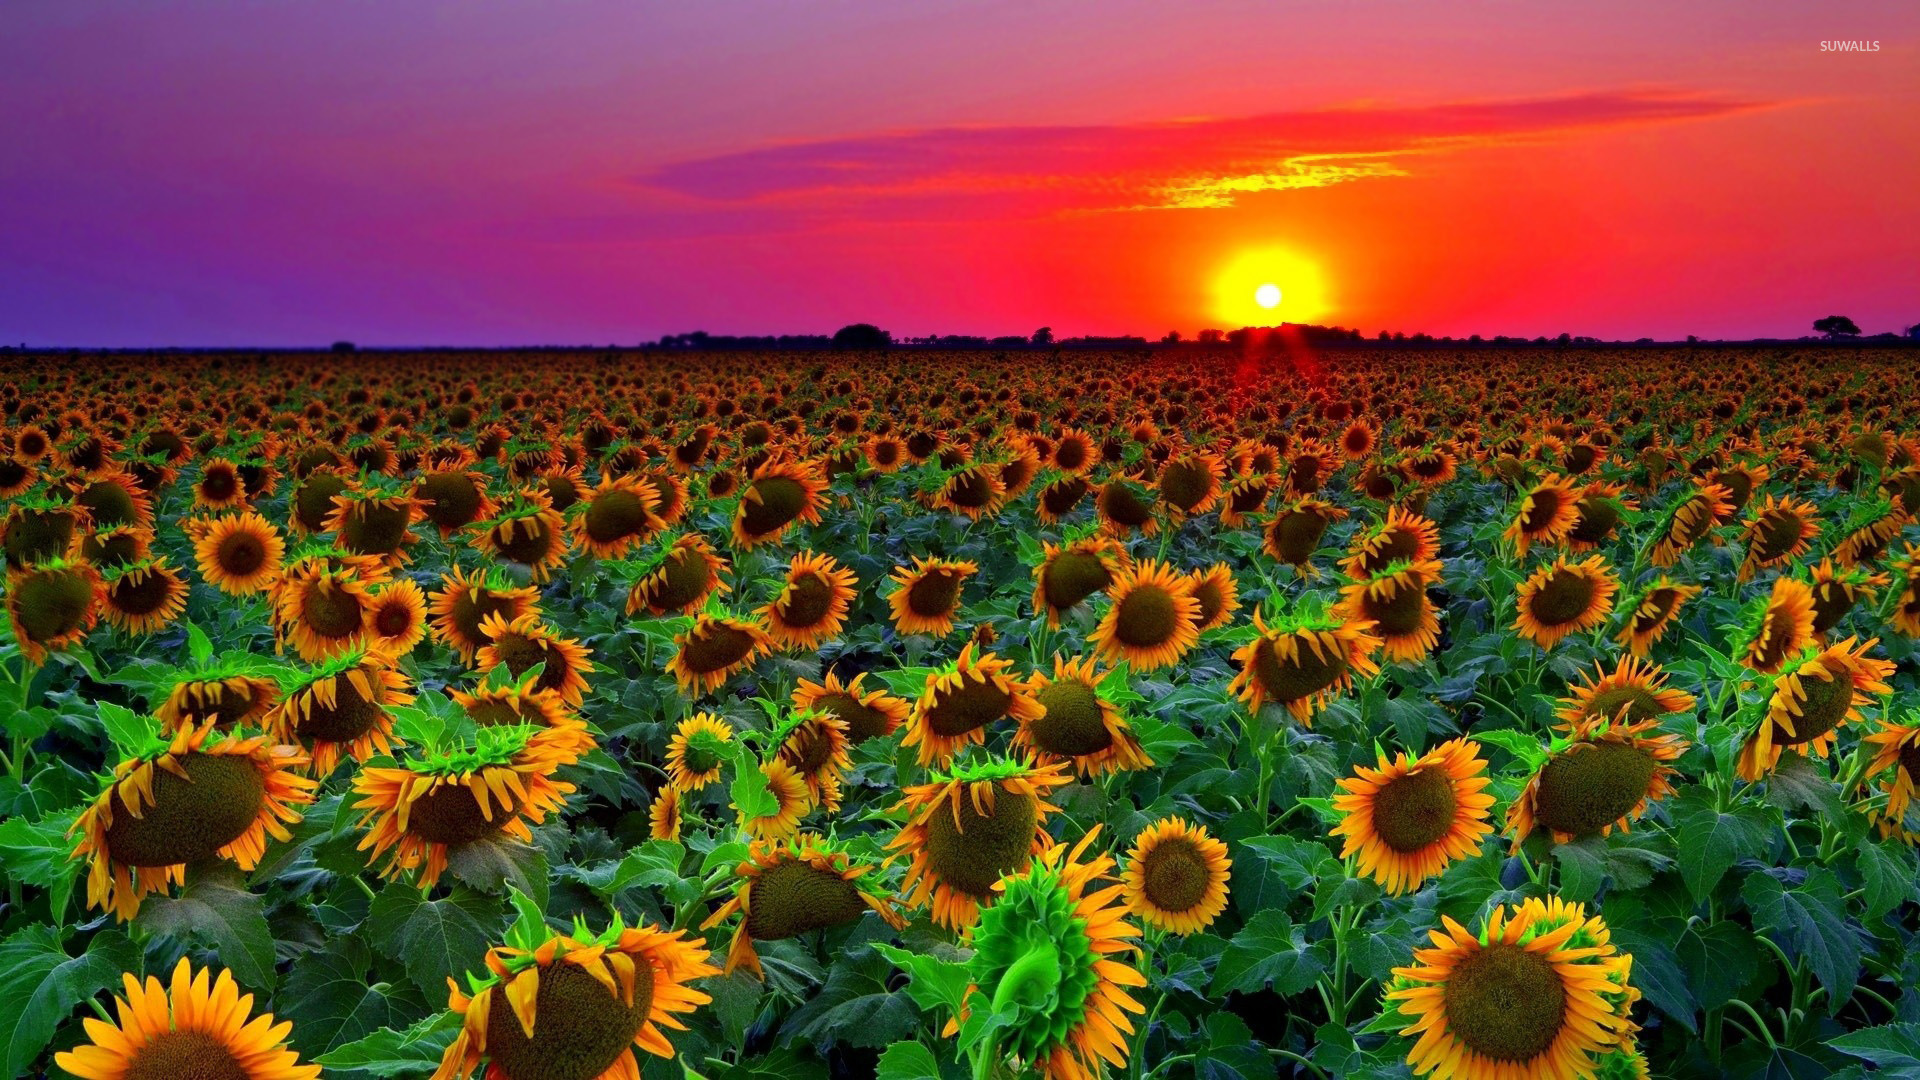 Sunflowers at sunset wallpaper